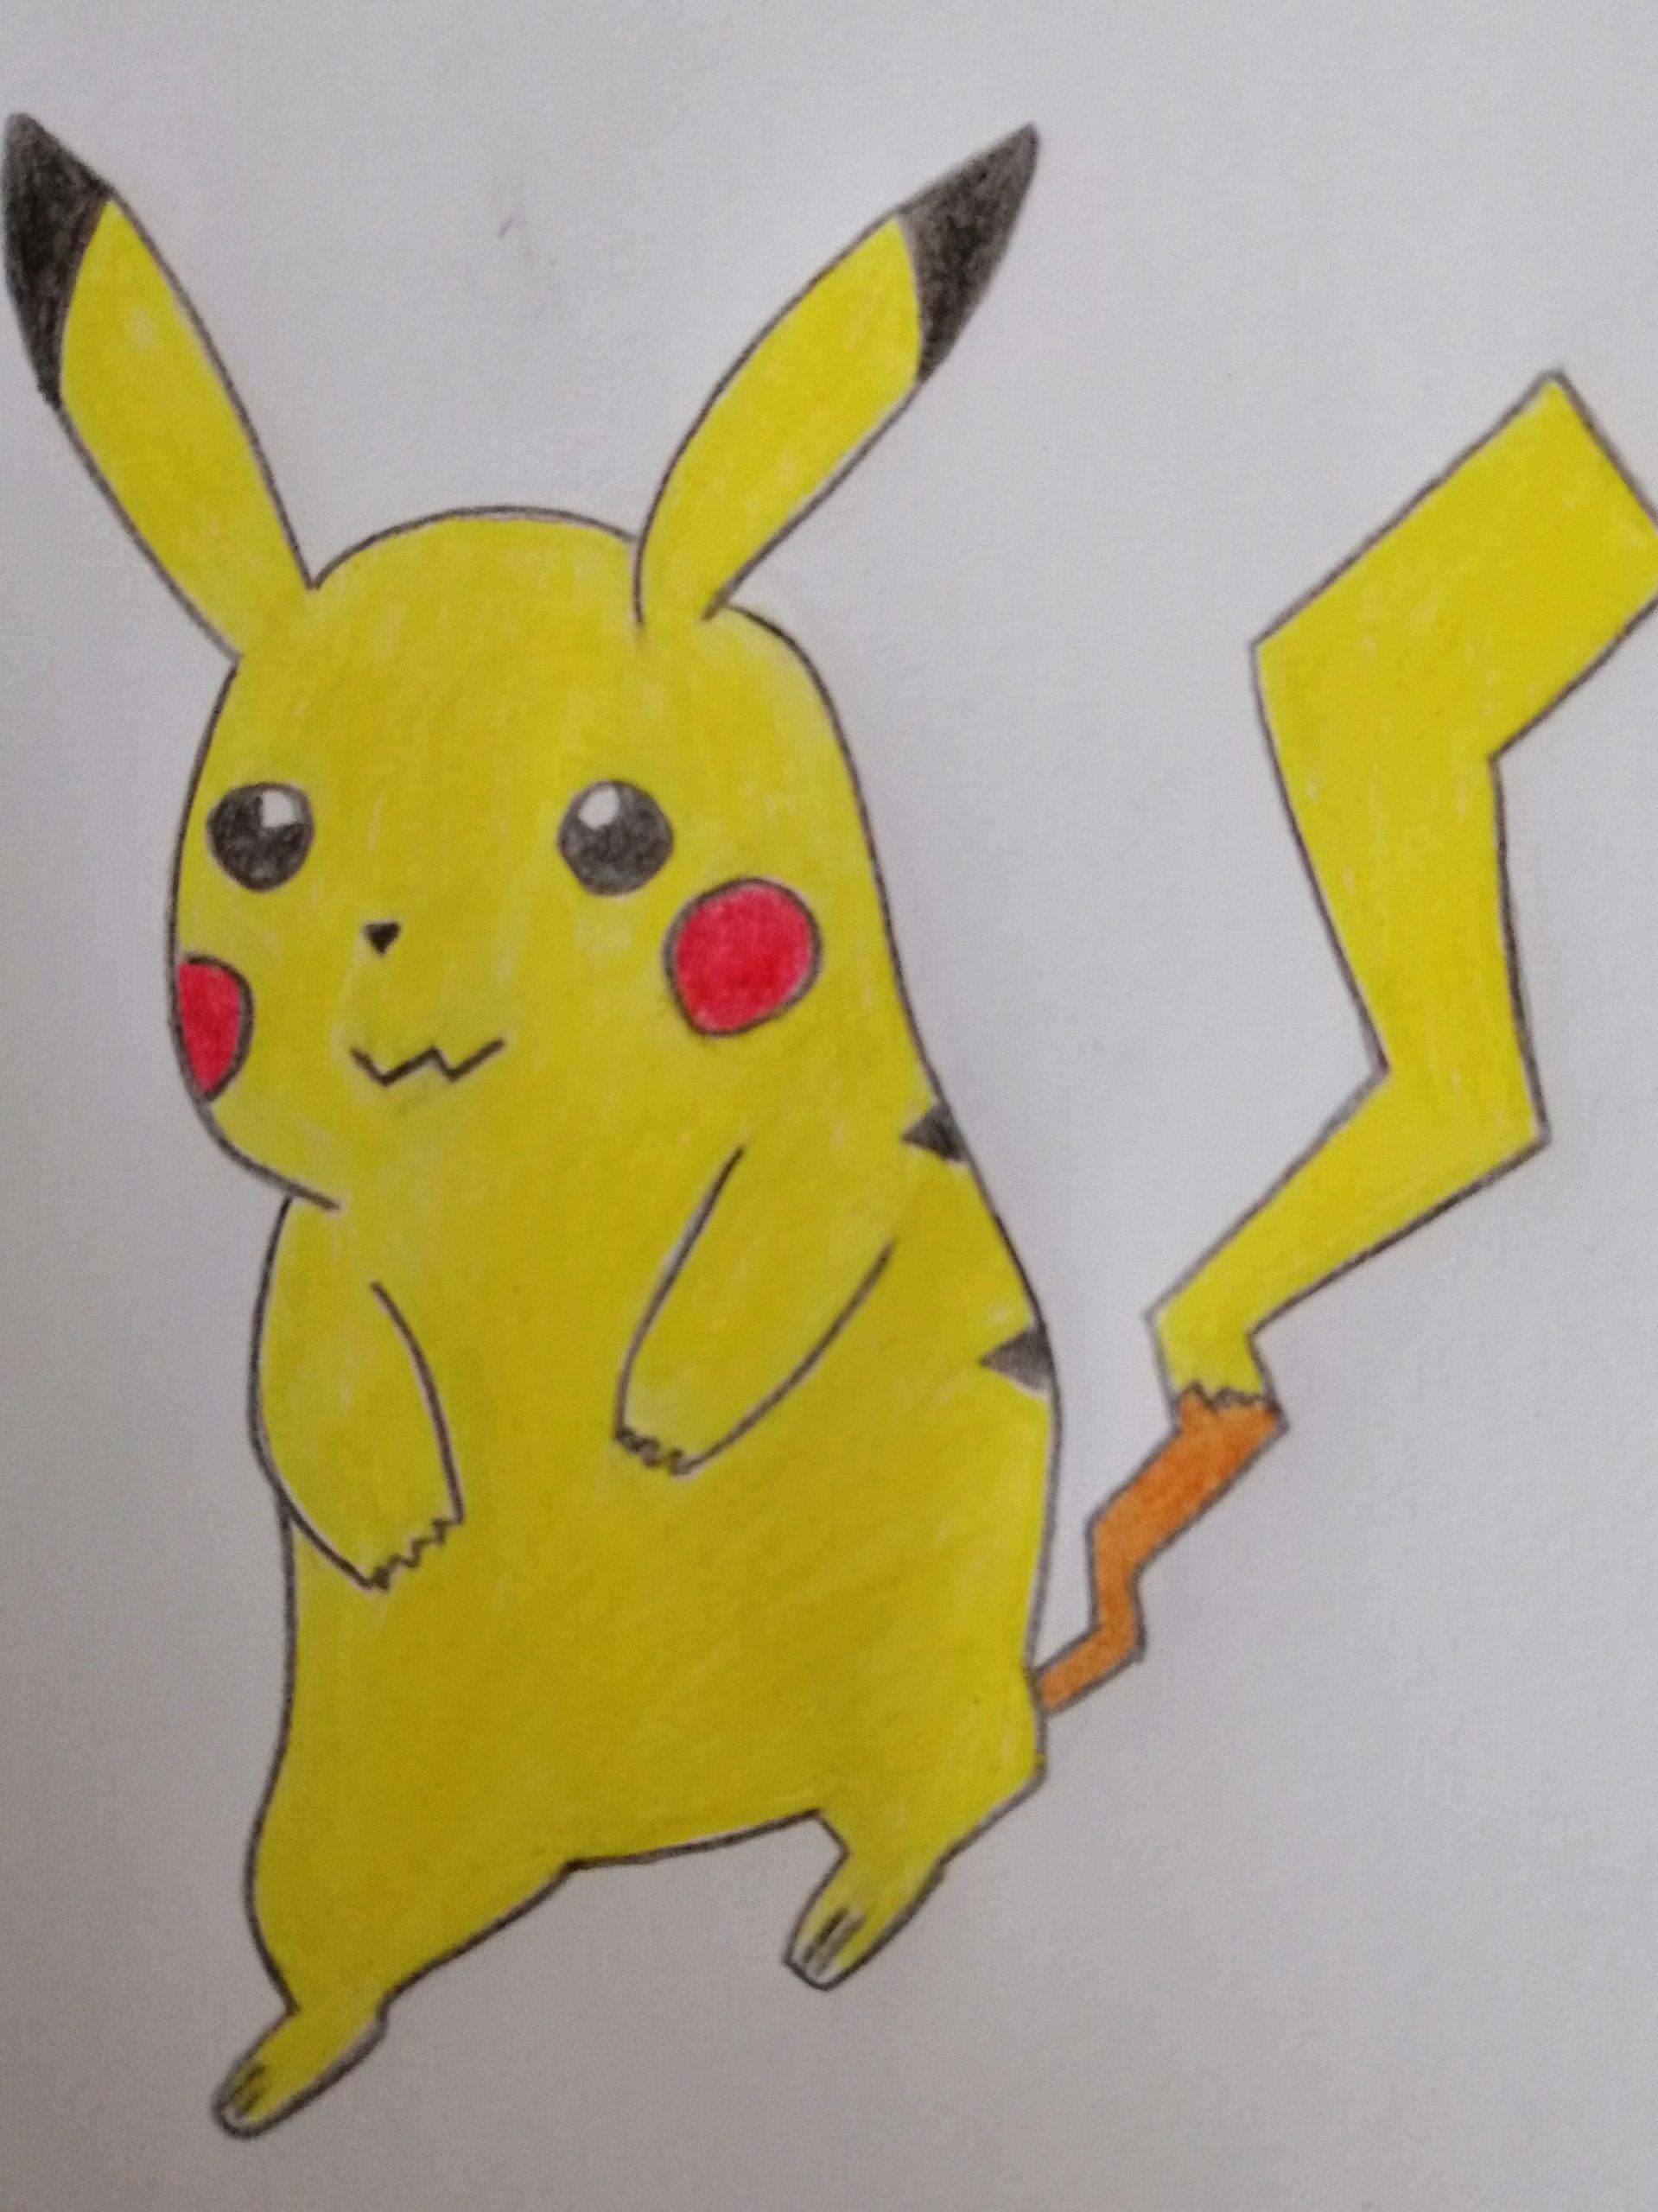 Comment Dessiner Pikachu - Dessindigo avec Dessin De Pikachu Facile